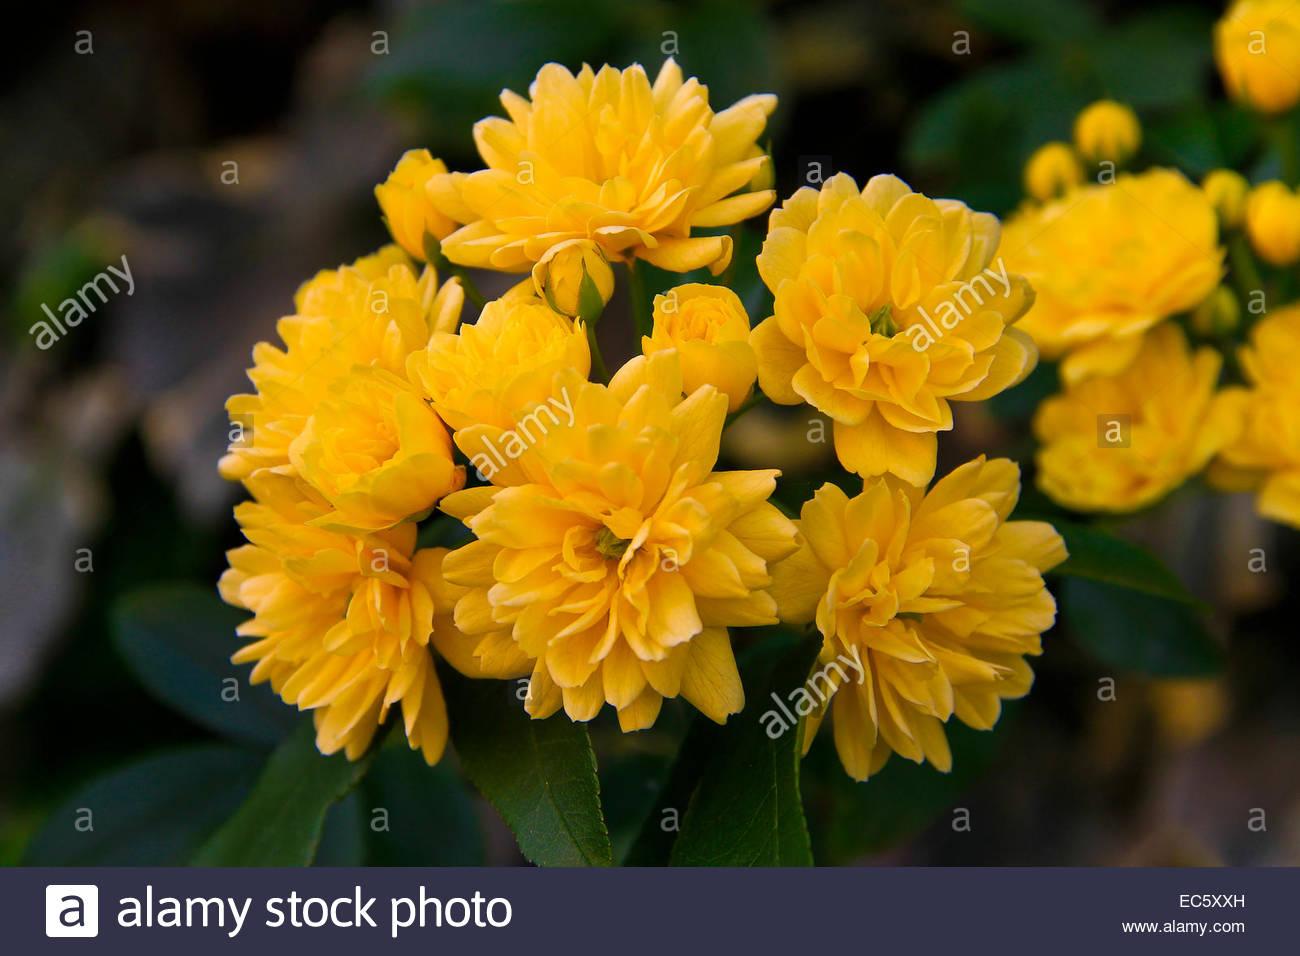 Yellow flowers on bush italy stock photos yellow flowers on bush common myrtle yellow flowers on bush italy stock image mightylinksfo